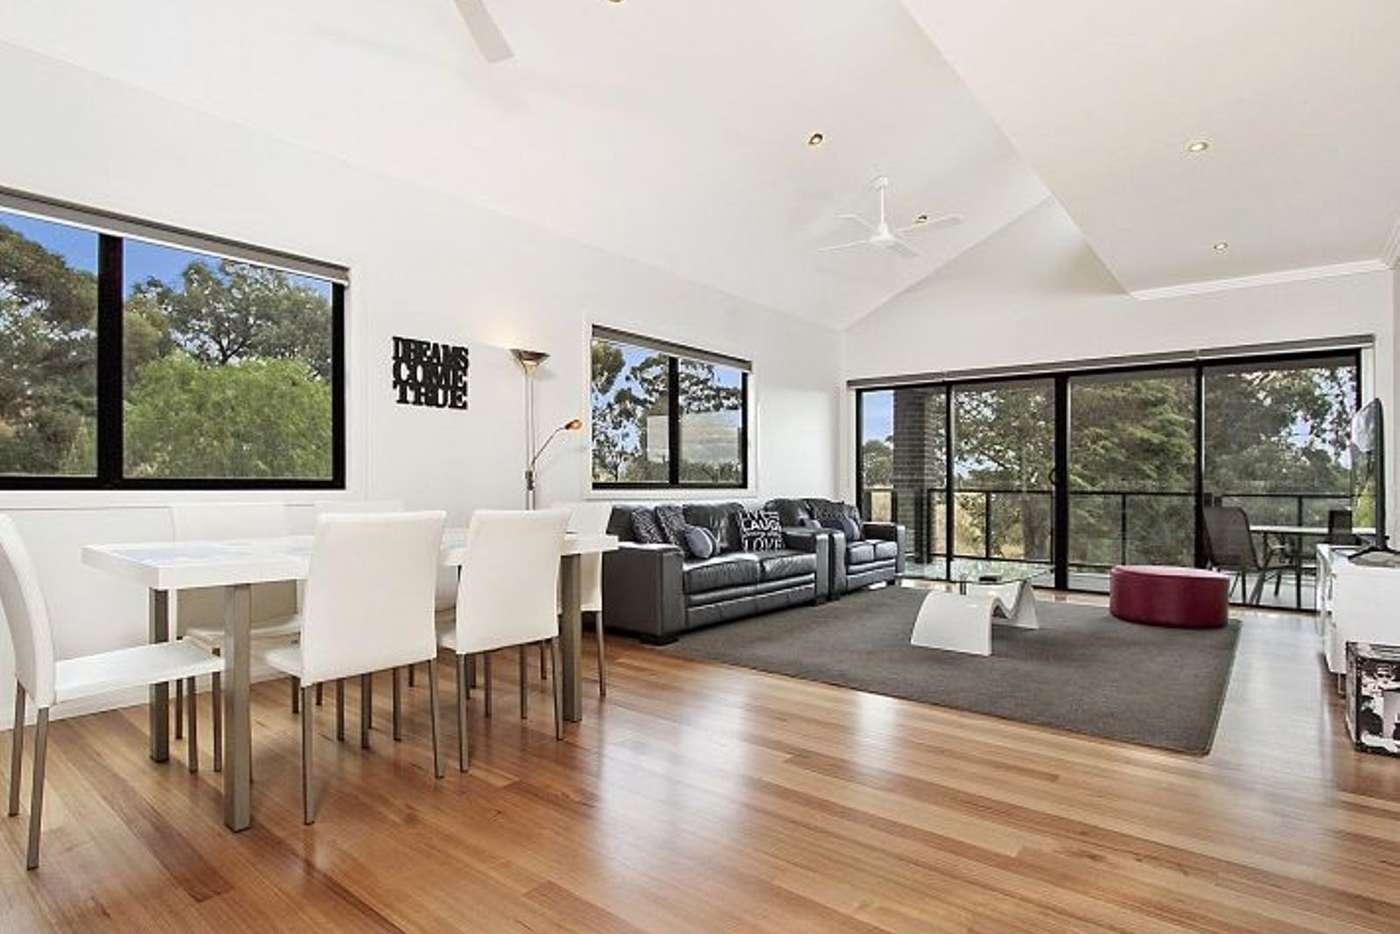 Main view of Homely house listing, 2/15 Abbott Street, Bendigo VIC 3550